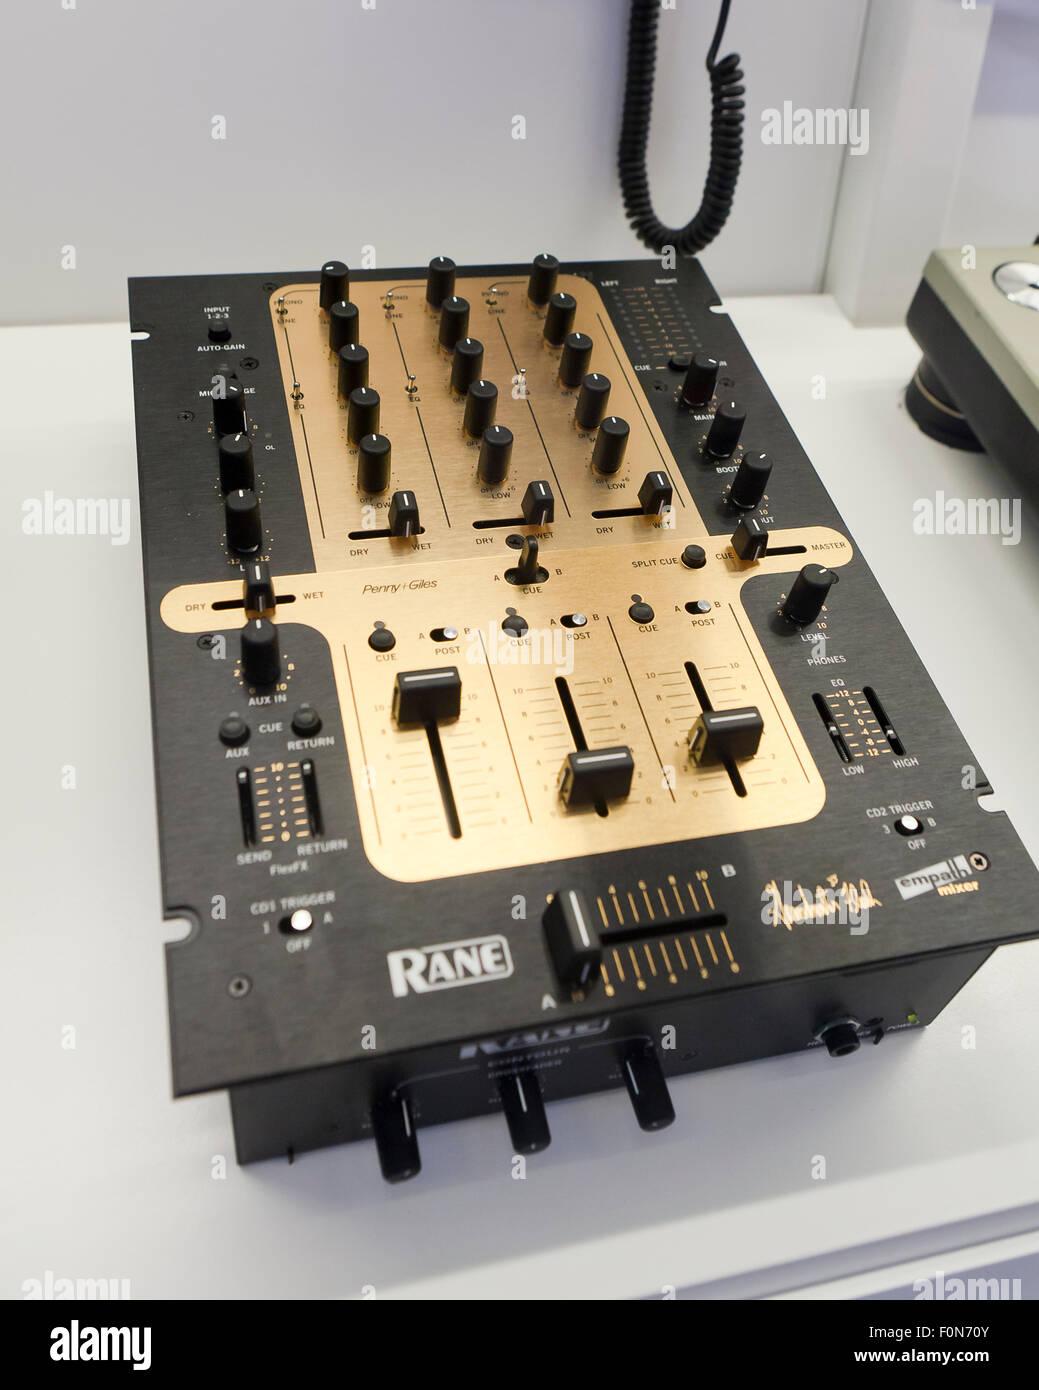 Rane Empath Mixer, Grand Master Flash model, circa 2003 - USA - Stock Image